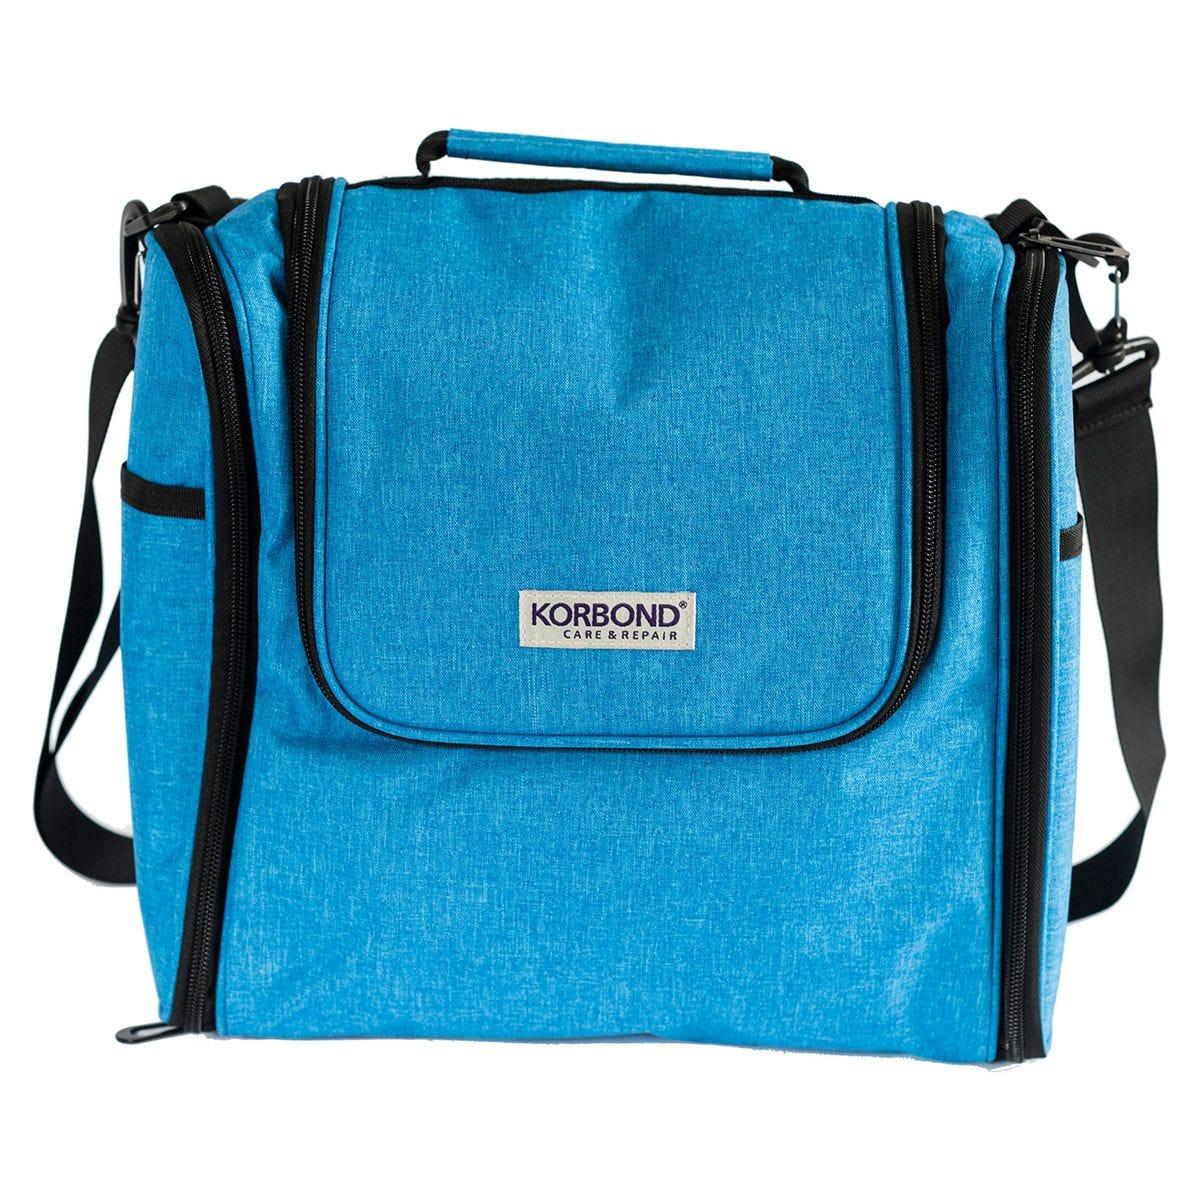 Korbond Yarn Storage Bag - Blue